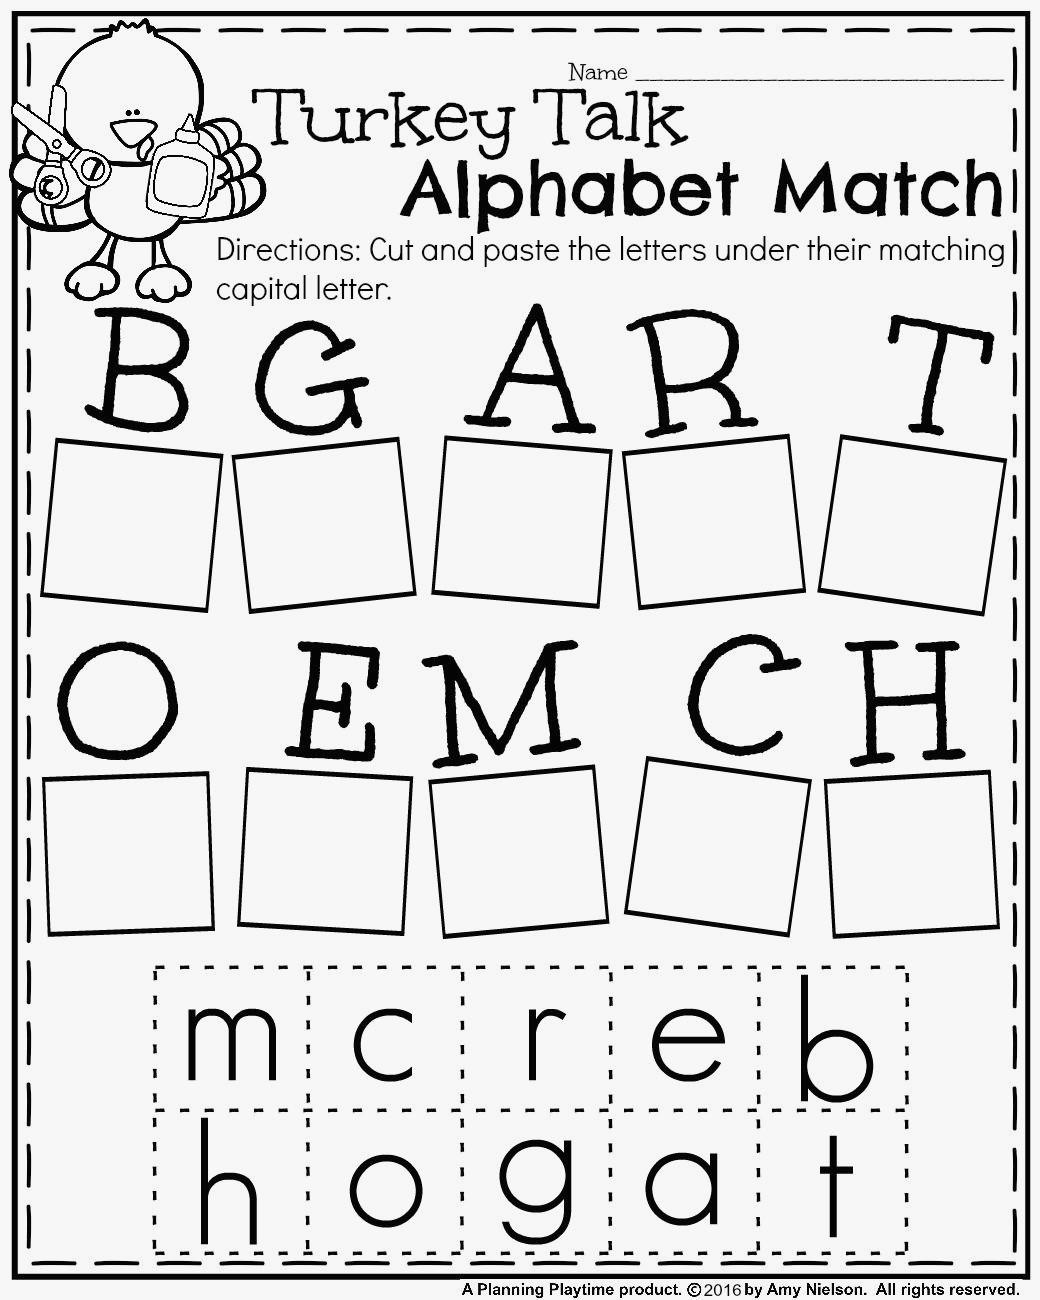 Free Alphabet Worksheets For 1st Grade